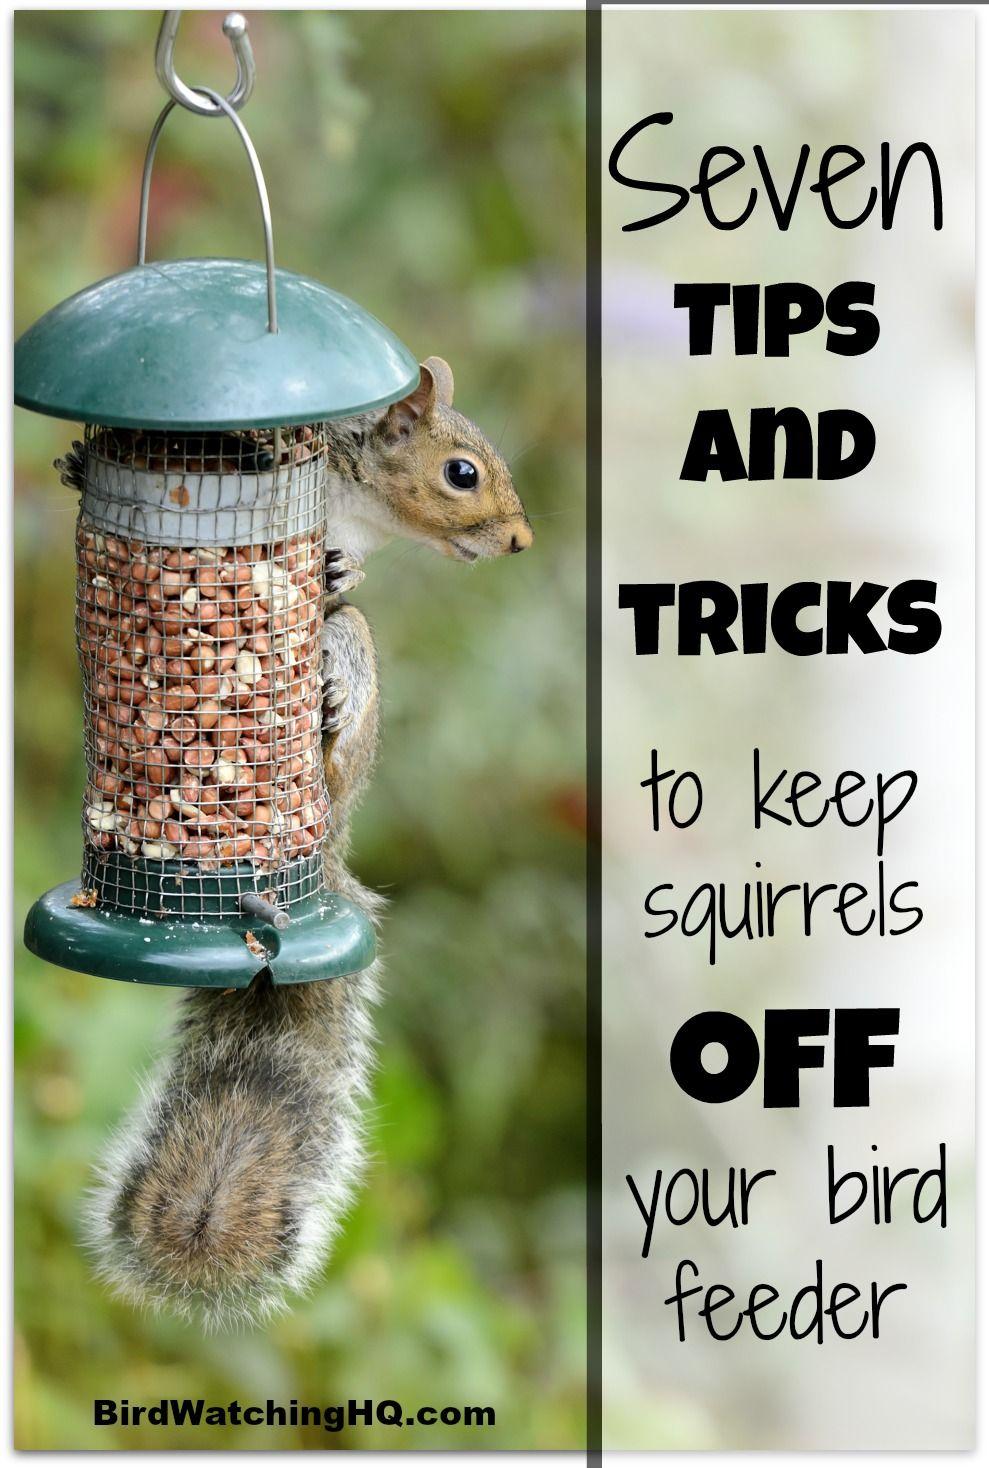 8 proven ways to keep squirrels off bird feeders 2021